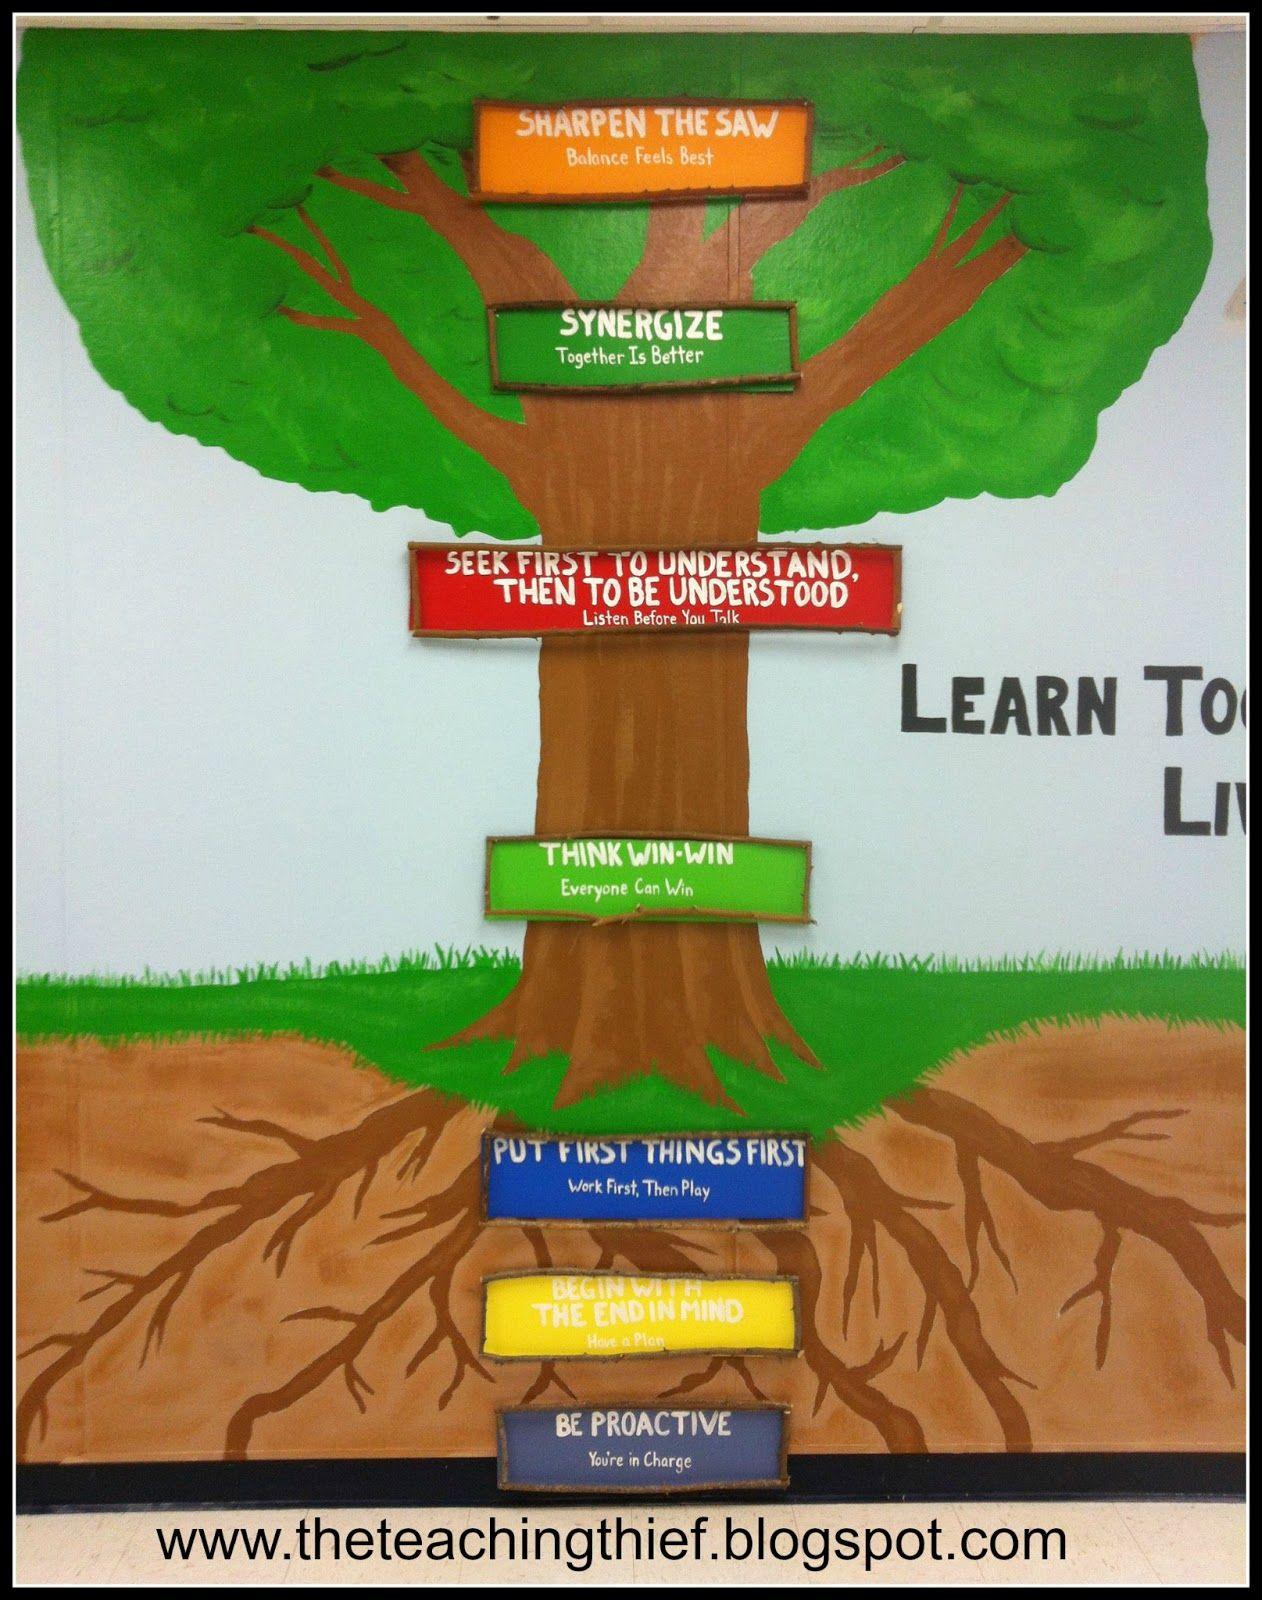 My School S Leader In Me 7 Habits Tree